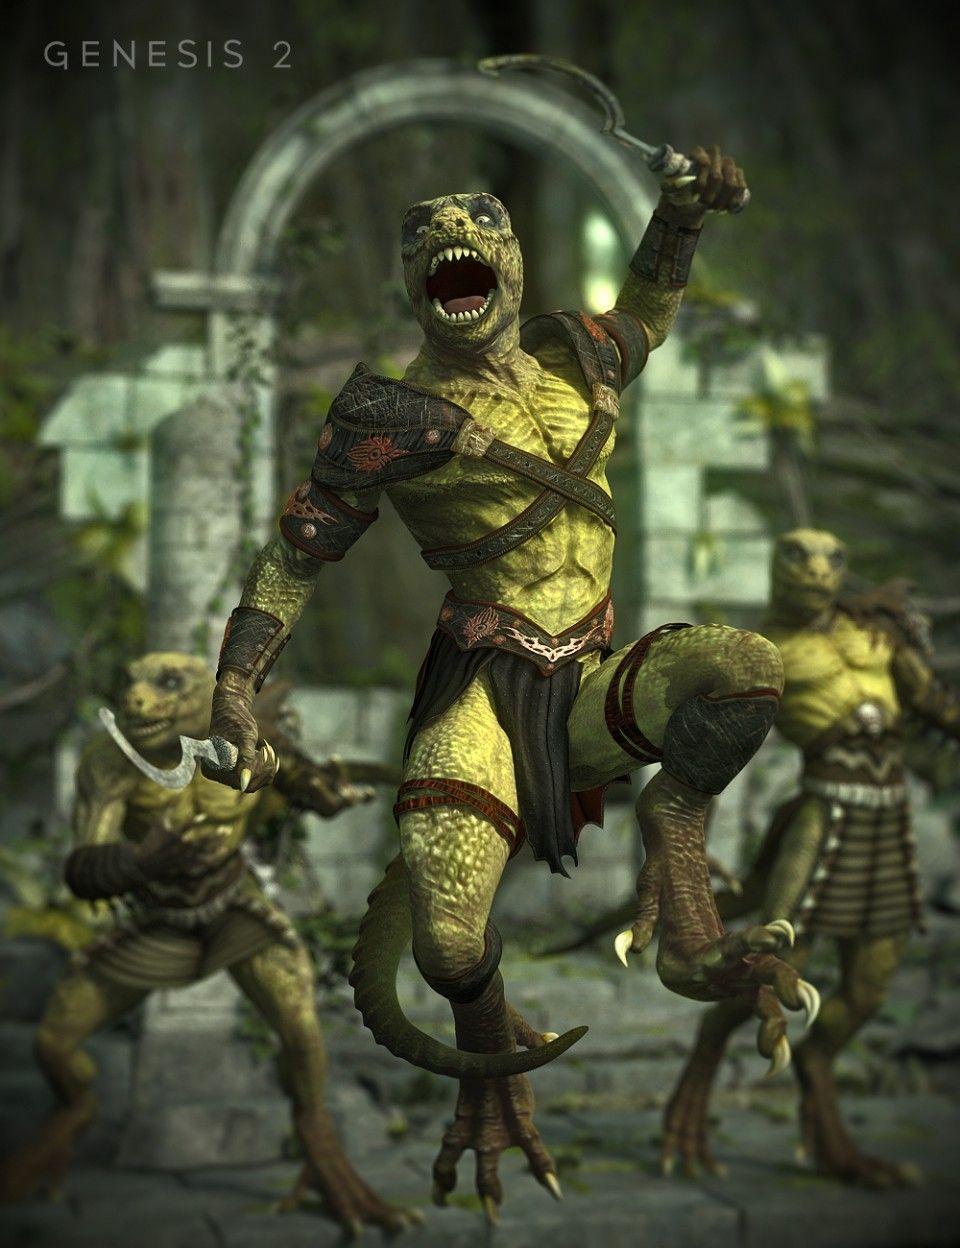 Tribal Warrior For Genesis 2 Male S Tribal Warrior Warrior Reptilian People